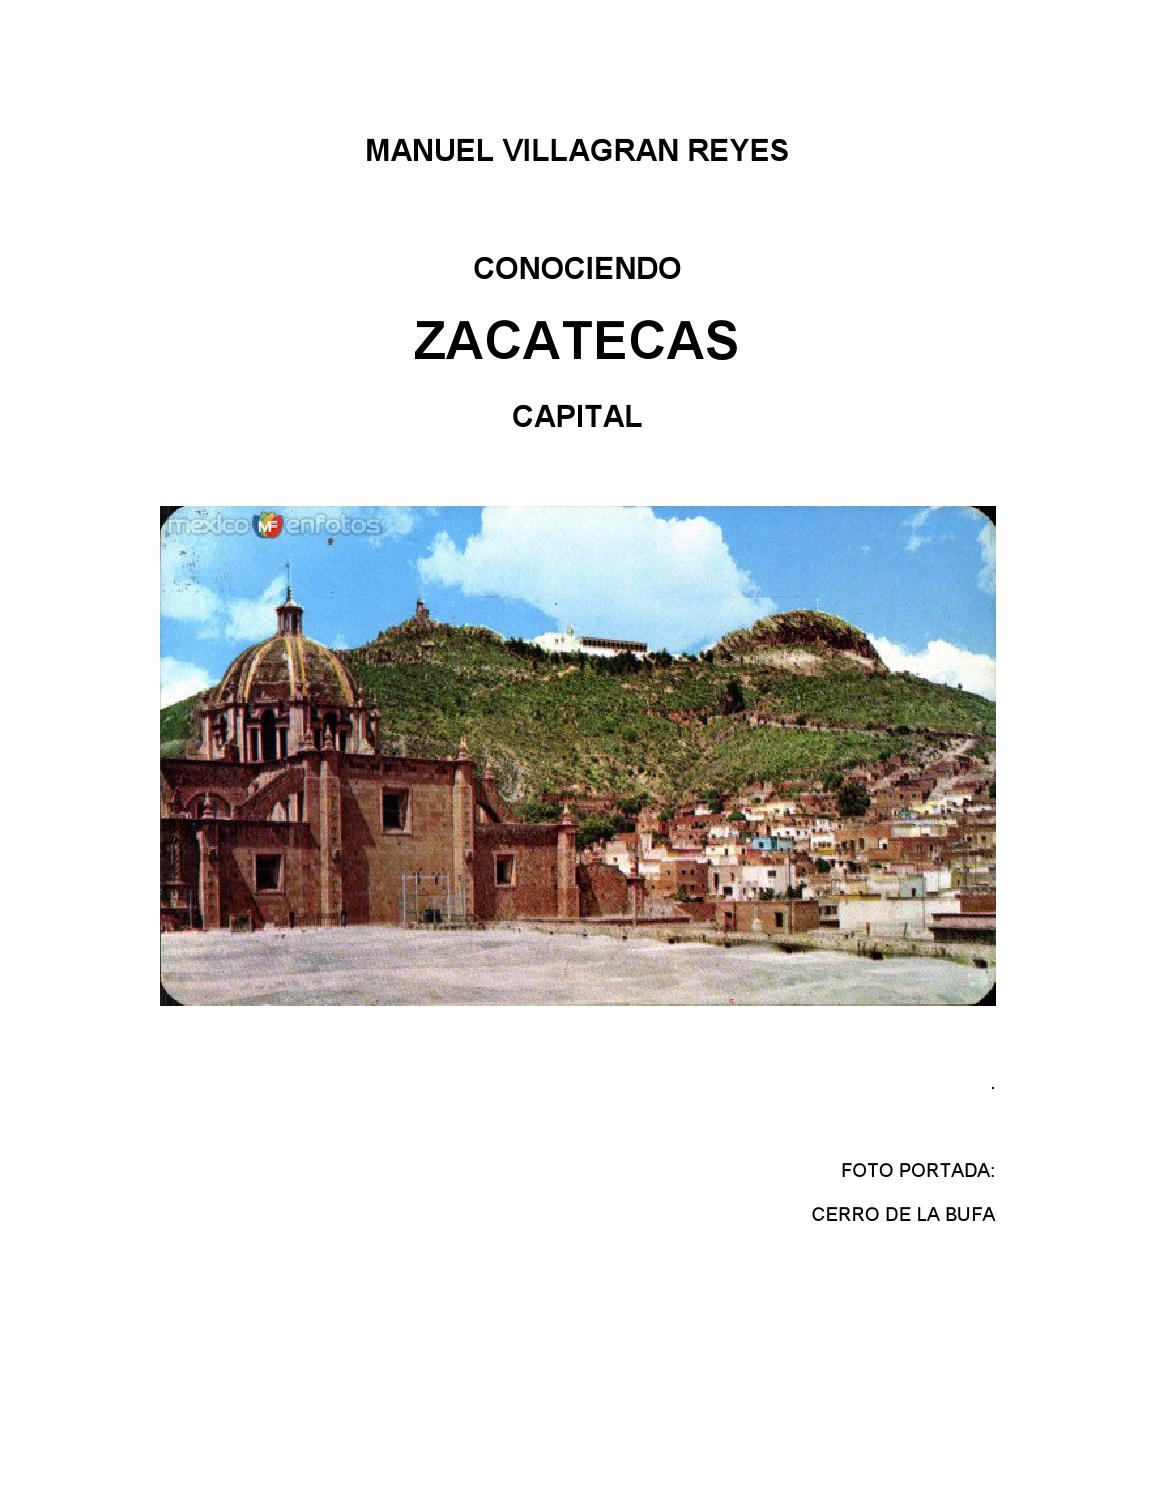 Conociendo Zacatecas Capital Guia Turistica By Manuel Villagran  # Muebles Goitia Tijuana